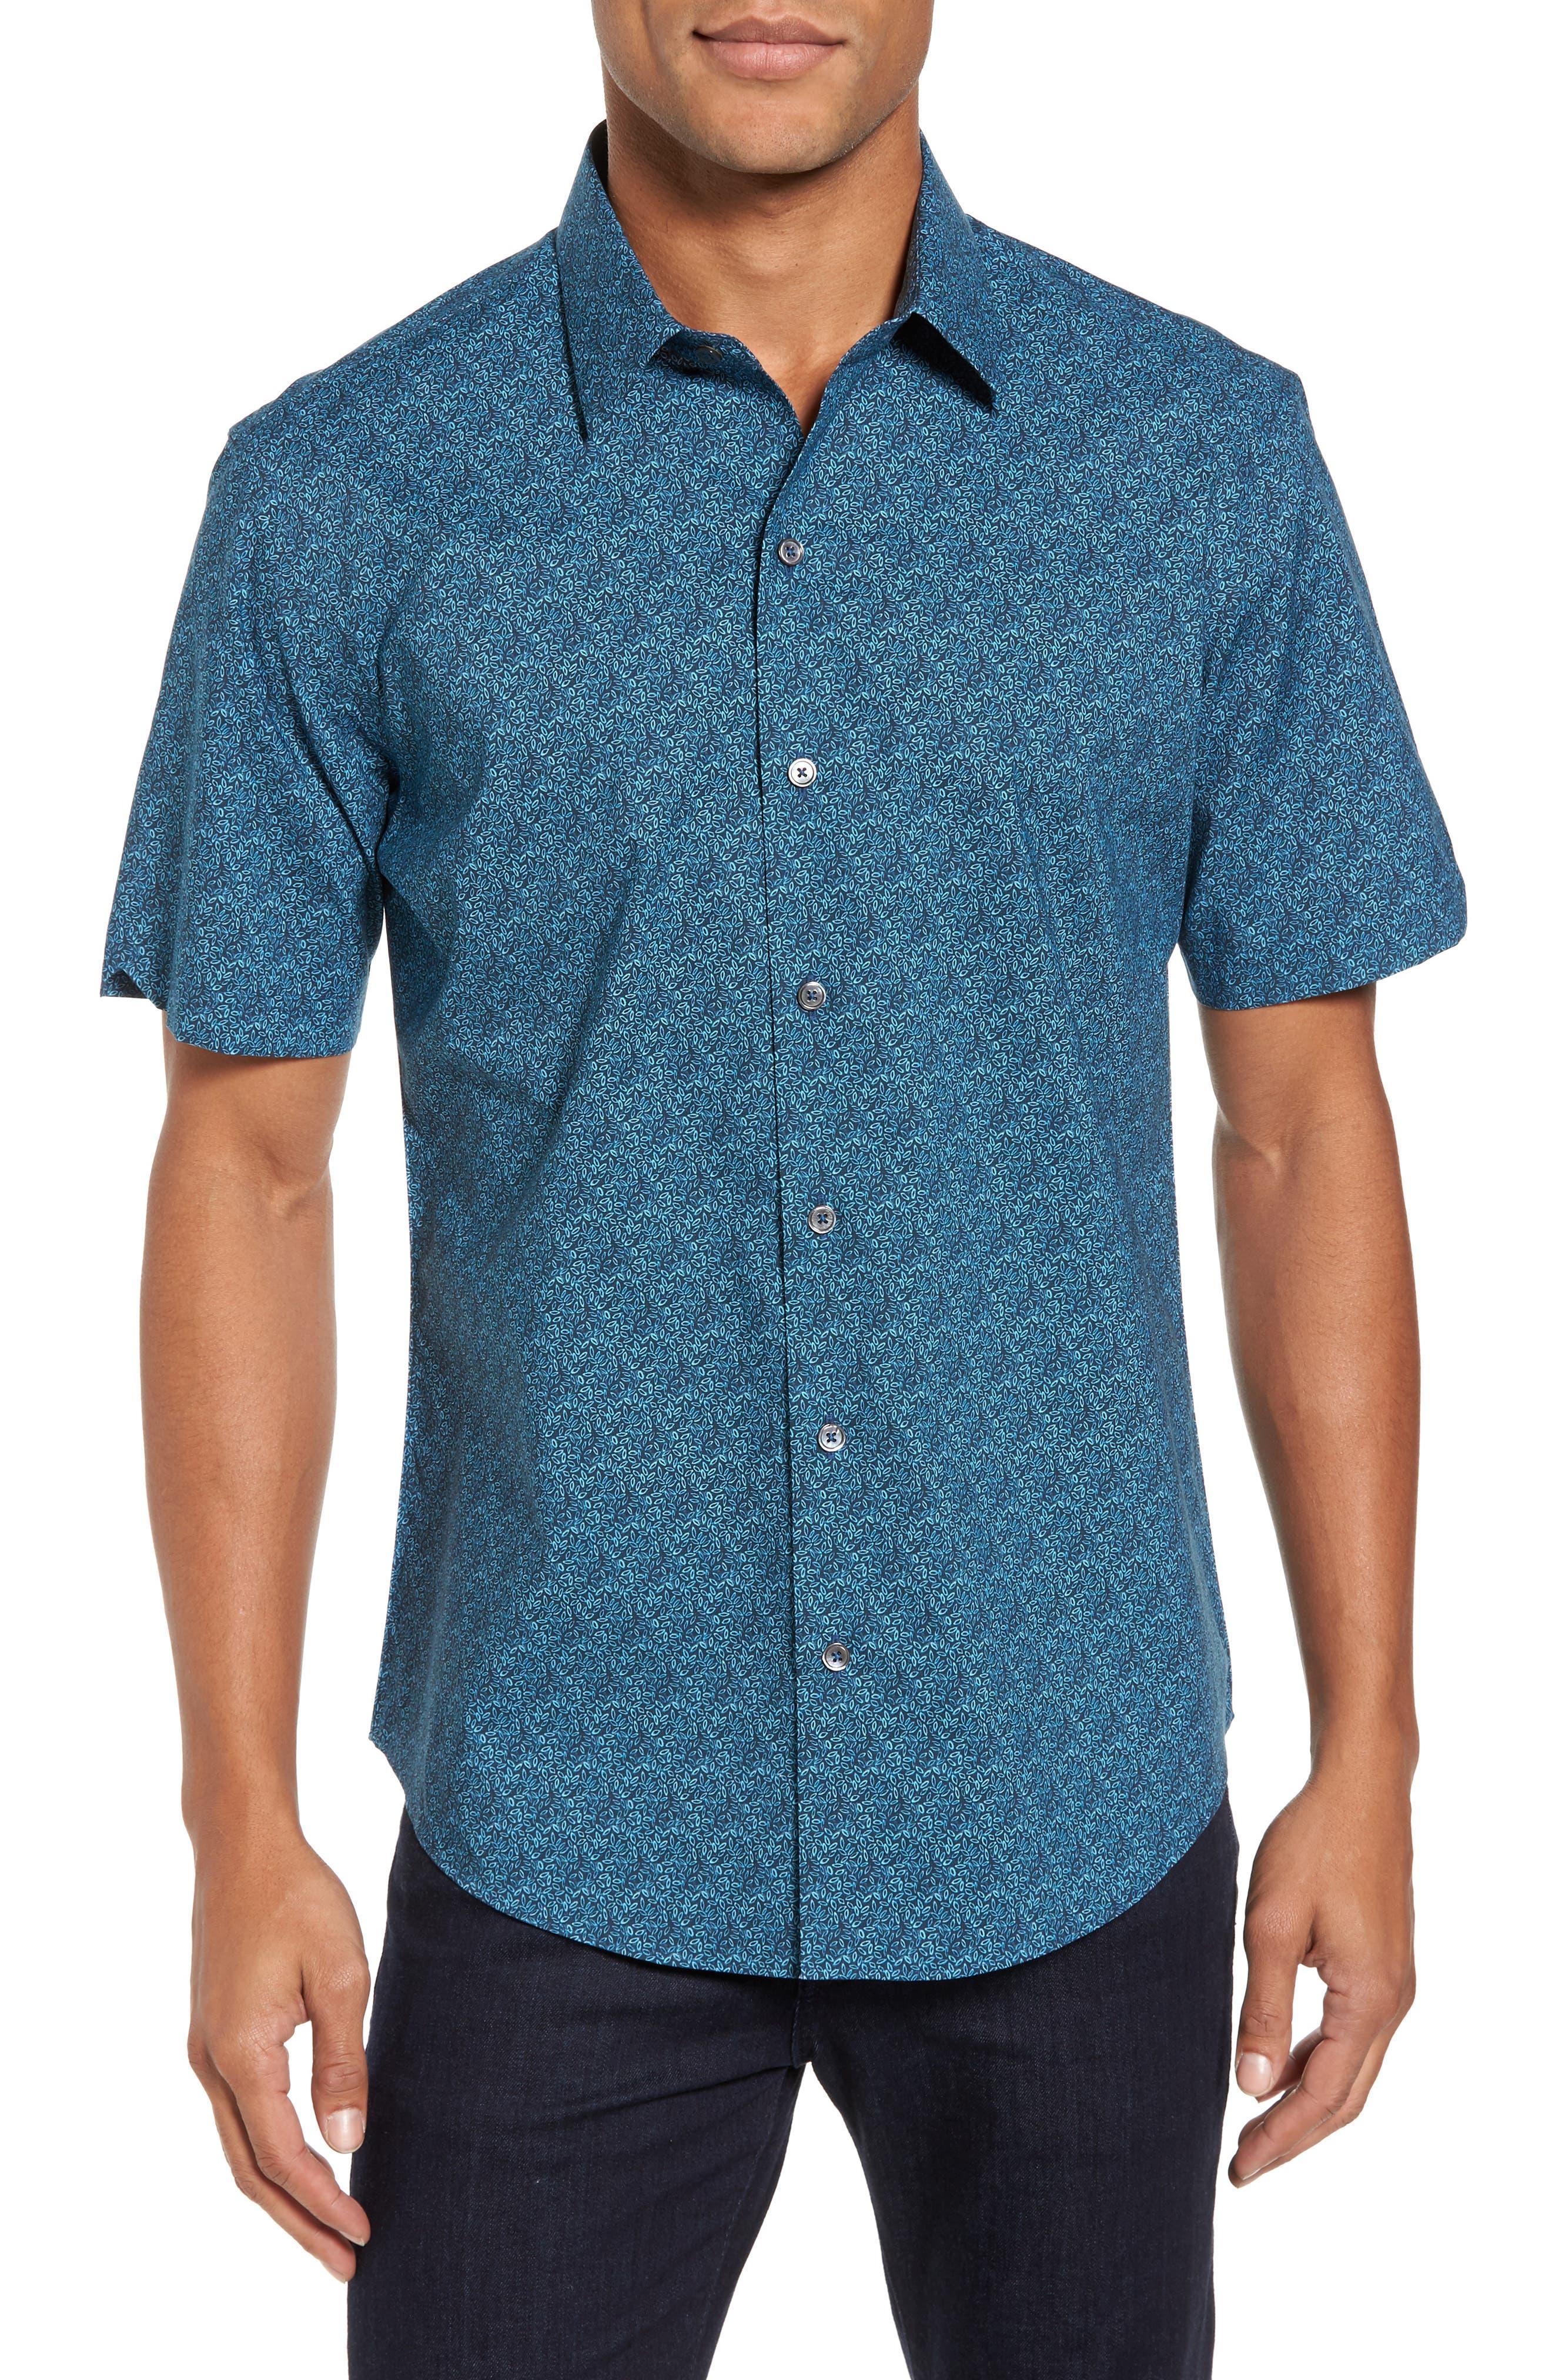 Alternate Image 1 Selected - Zachary Prell Machnee Slim Fit Print Sport Shirt